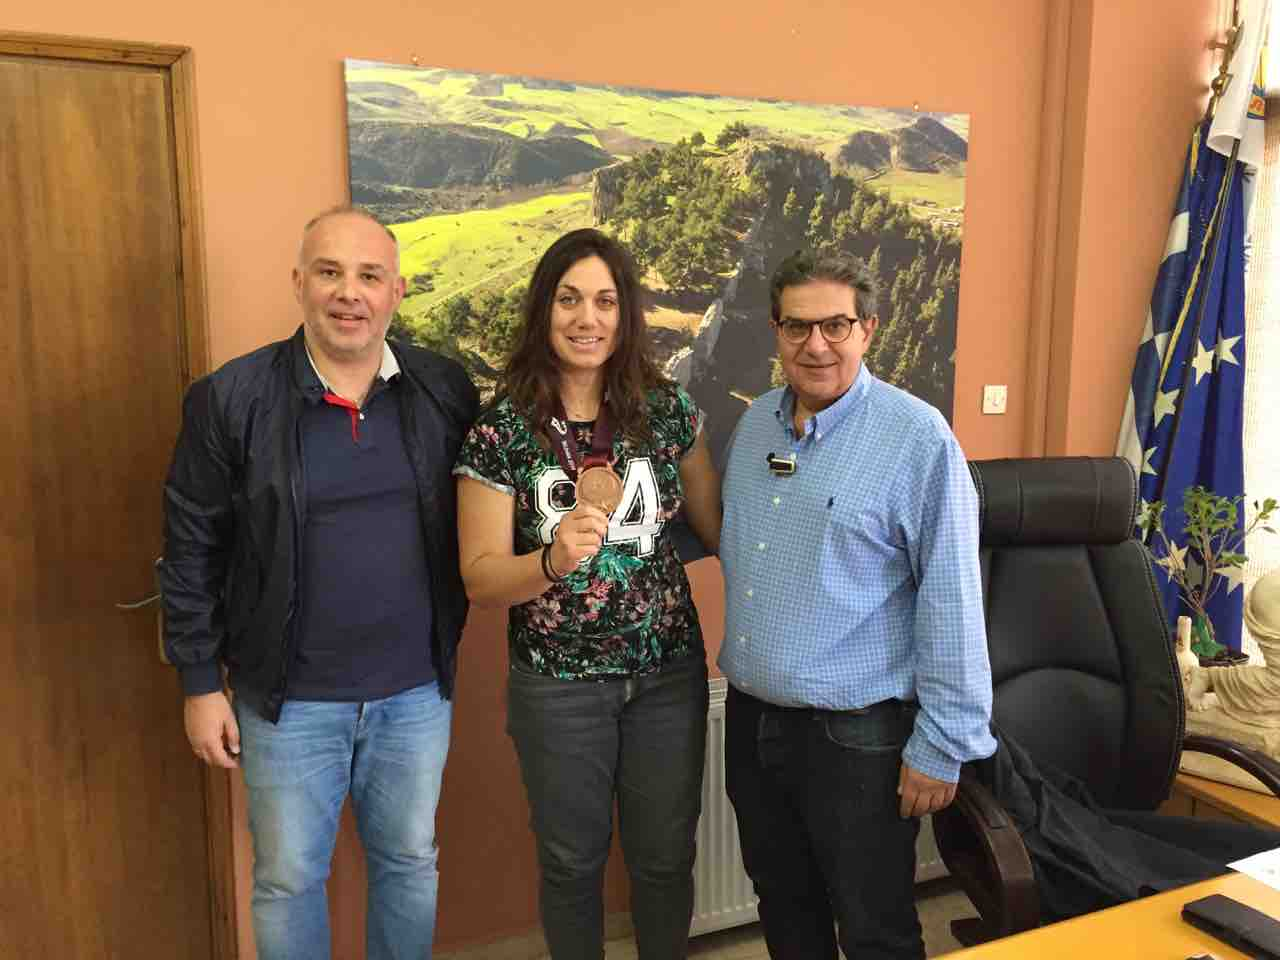 Photo of Εσκίογλου: Να γίνει αθλητική πρέσβειρα των Φαρσάλων διεθνώς, η πρωταθλήτρια Κρίστυ Αναγνωστοπούλου